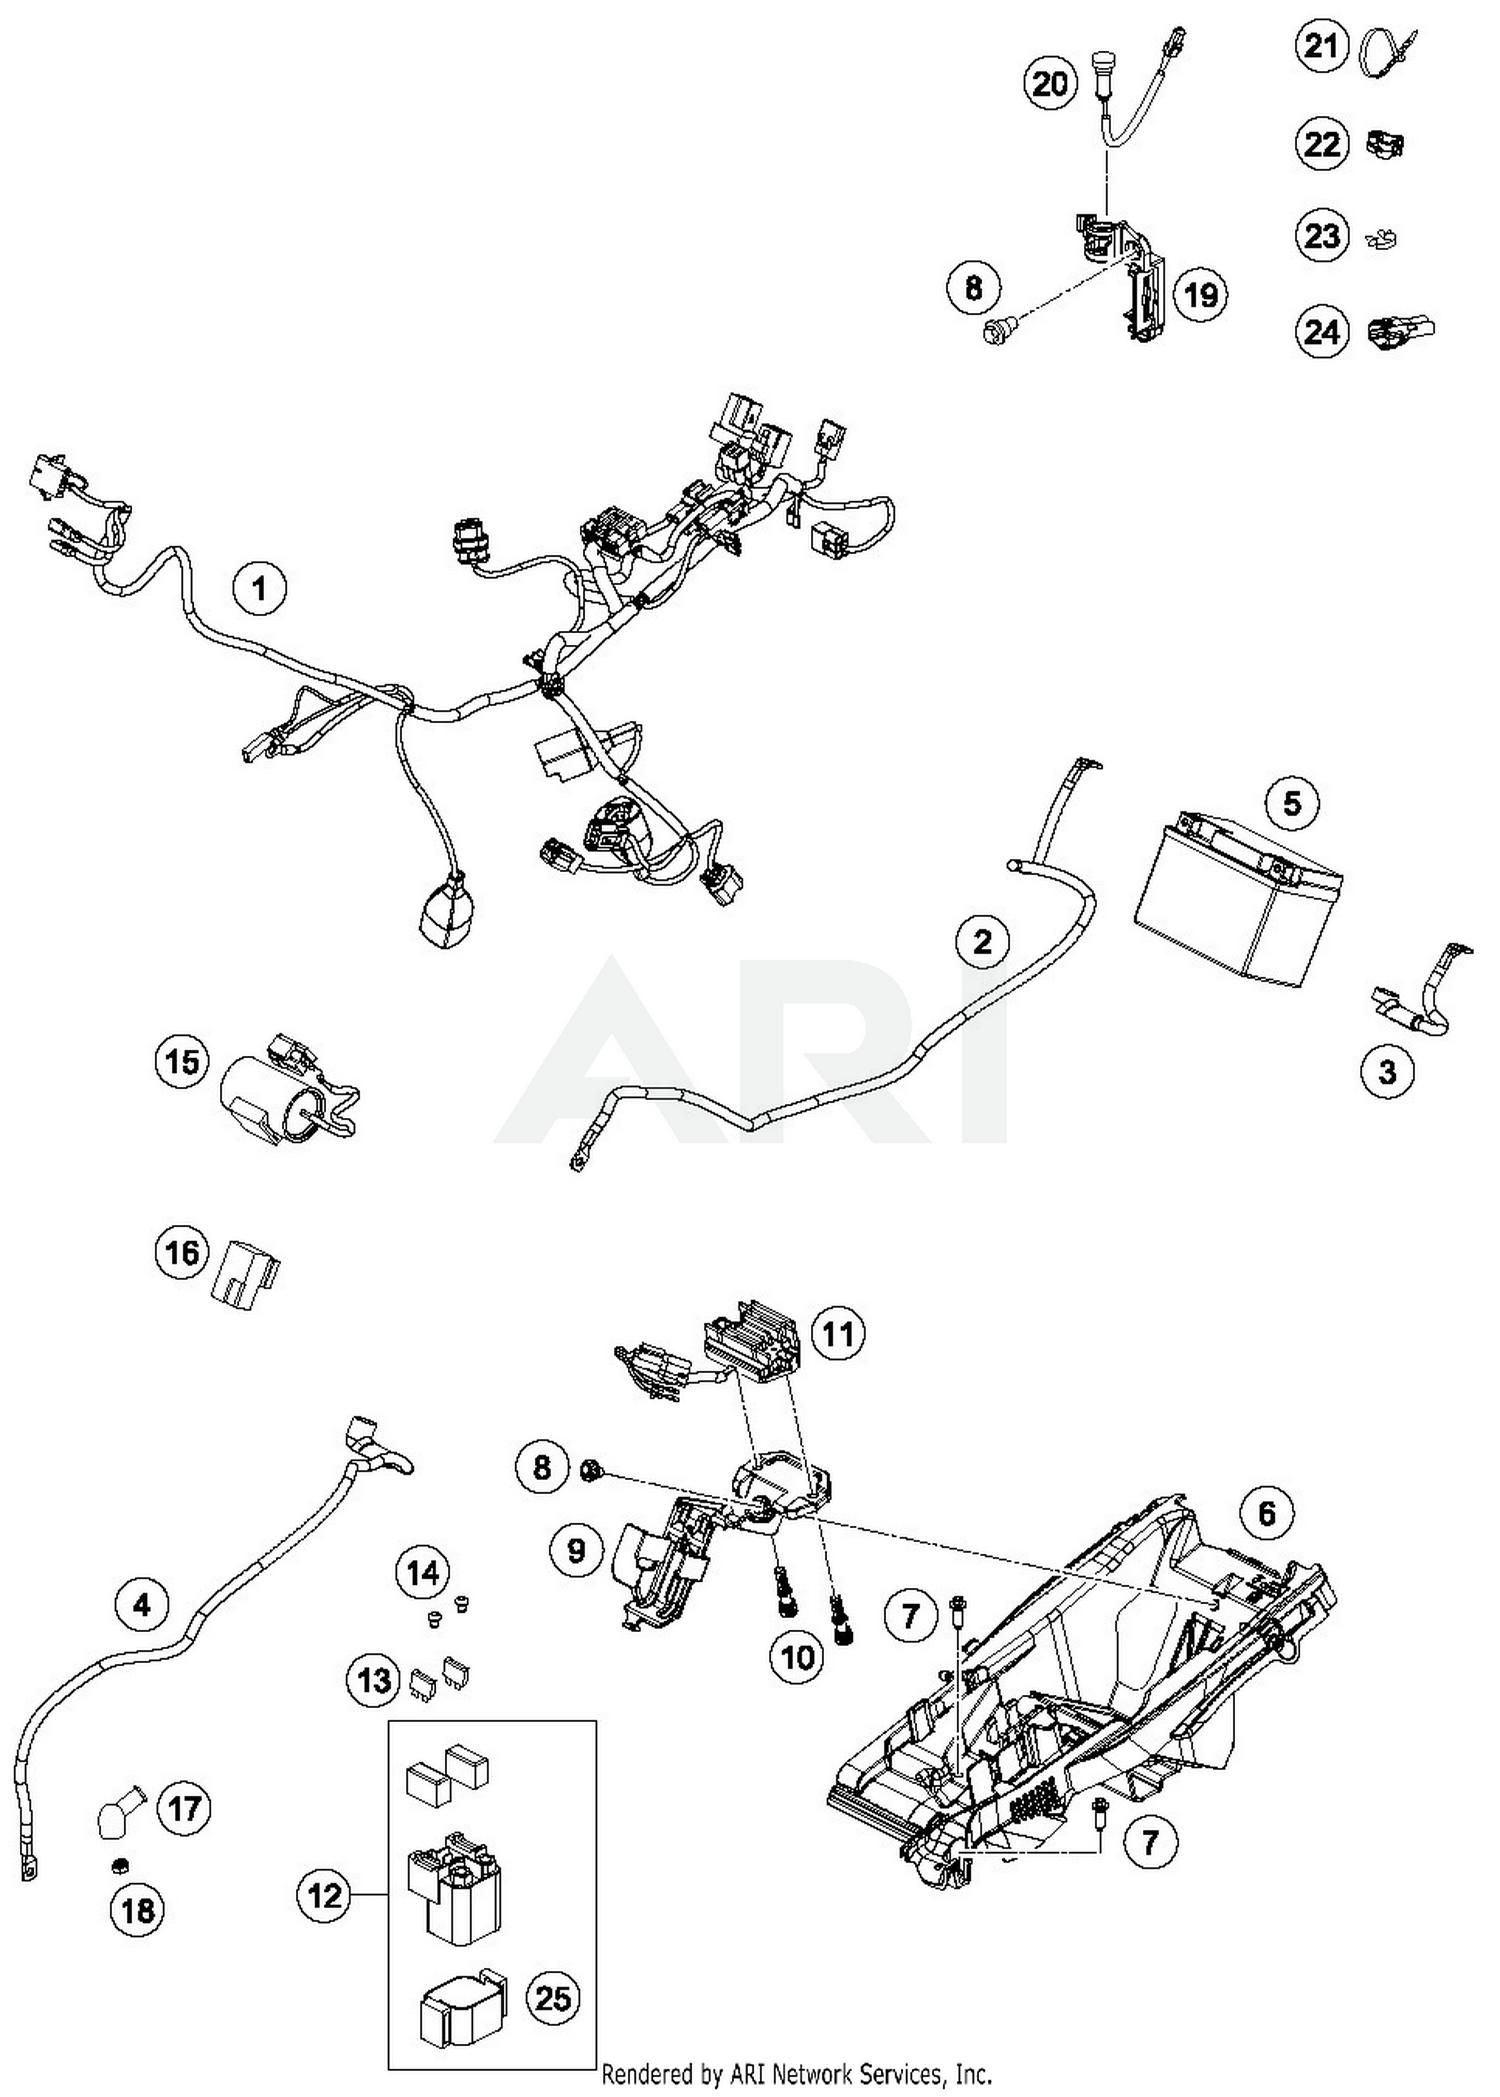 Awesome 2019 Husqvarna Fc 450 Wiring Harness Parts Best Oem Wiring 101 Ziduromitwellnesstrialsorg